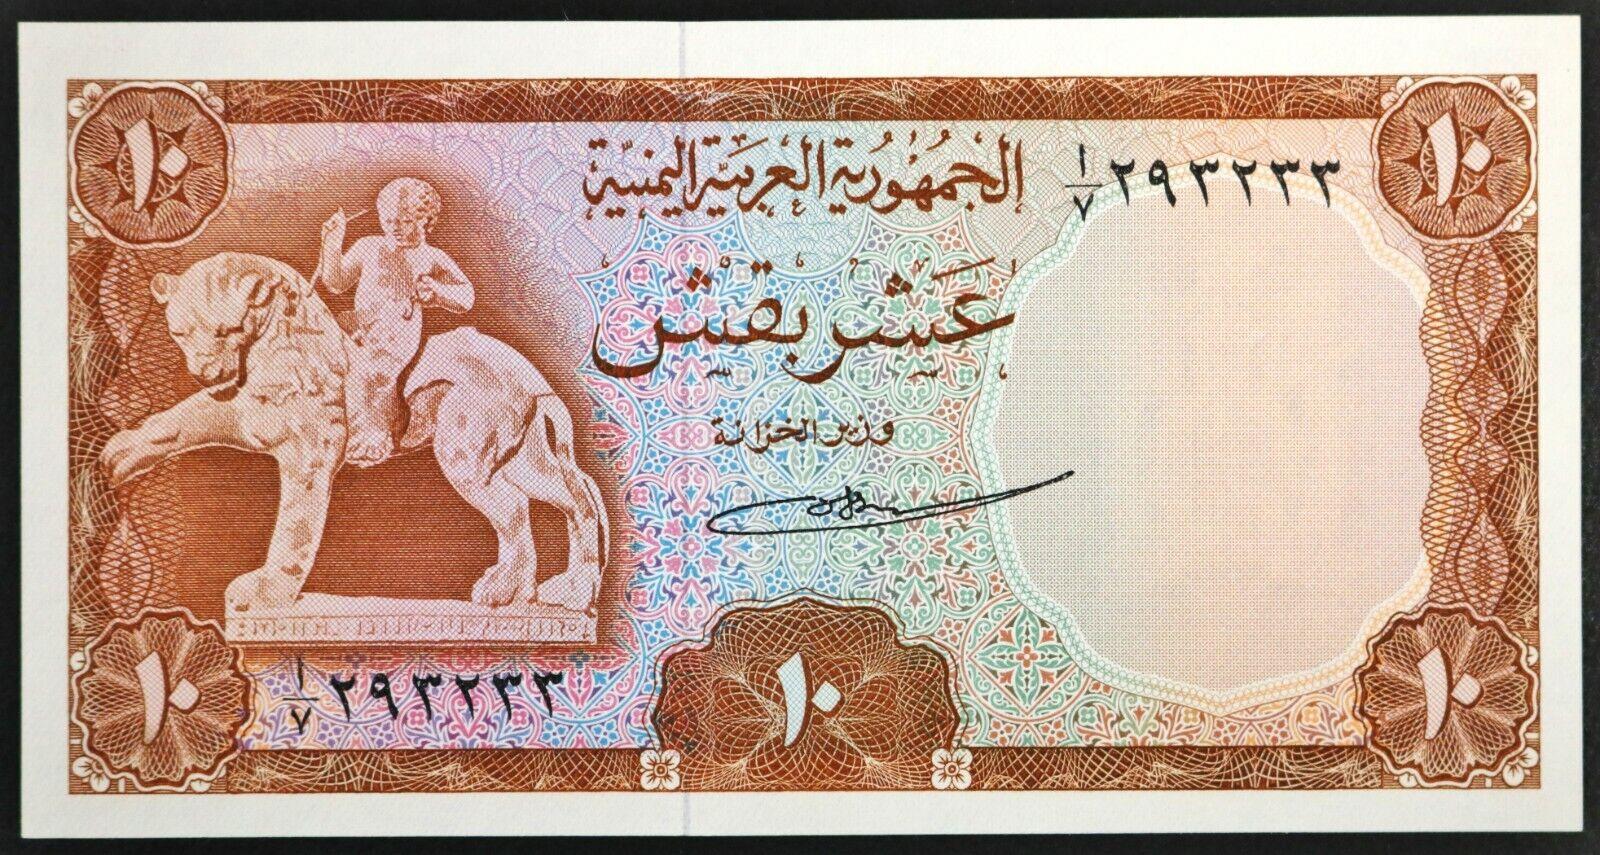 1966 Yemen 10 Dollar Bank Note - $12.01